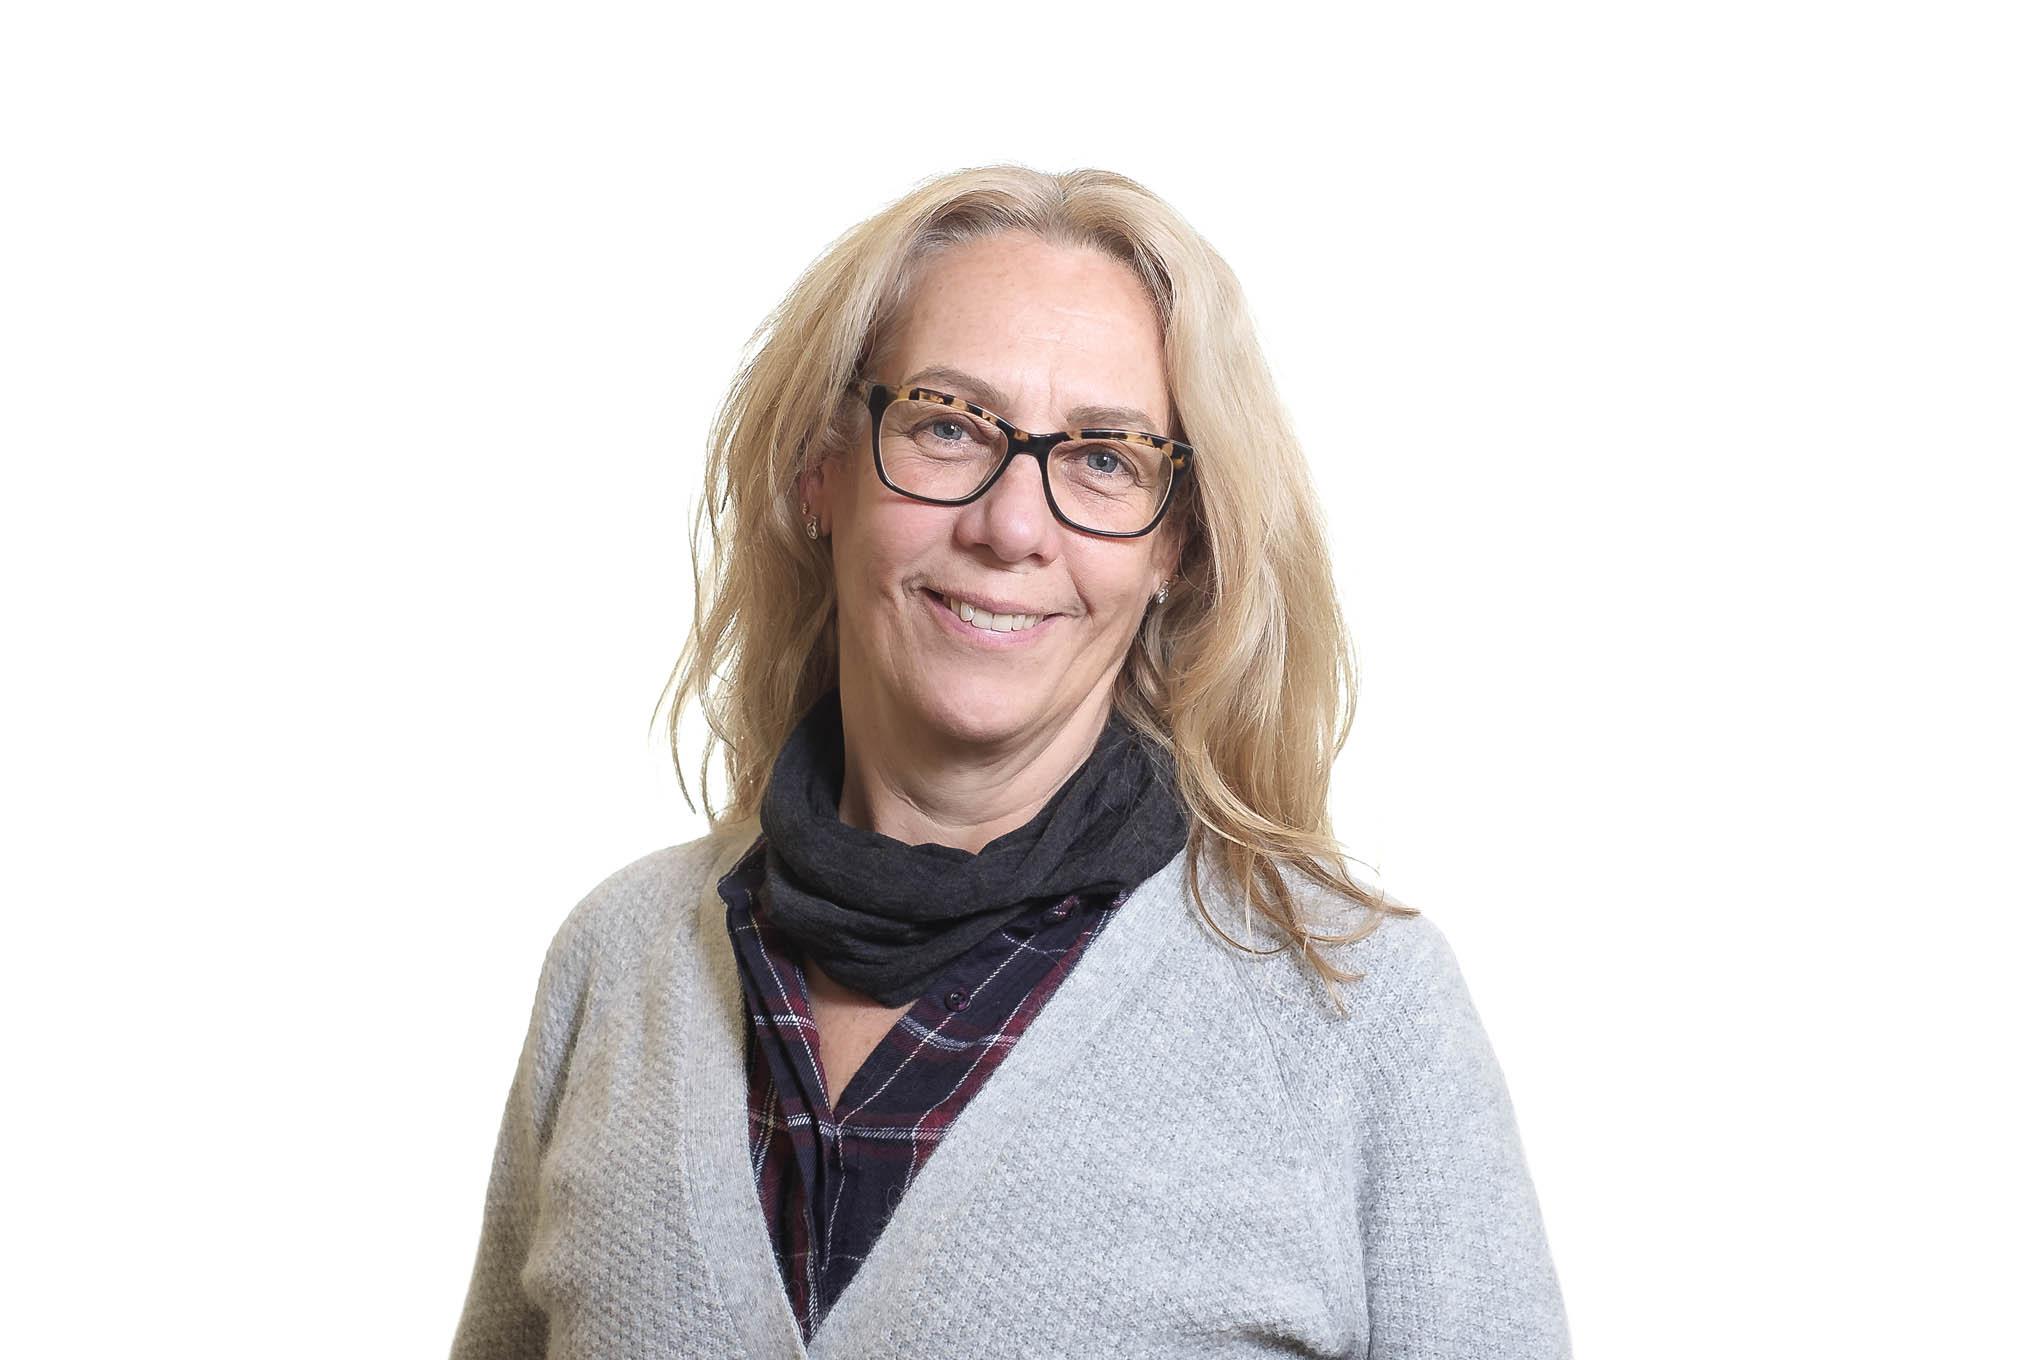 Doris Hein